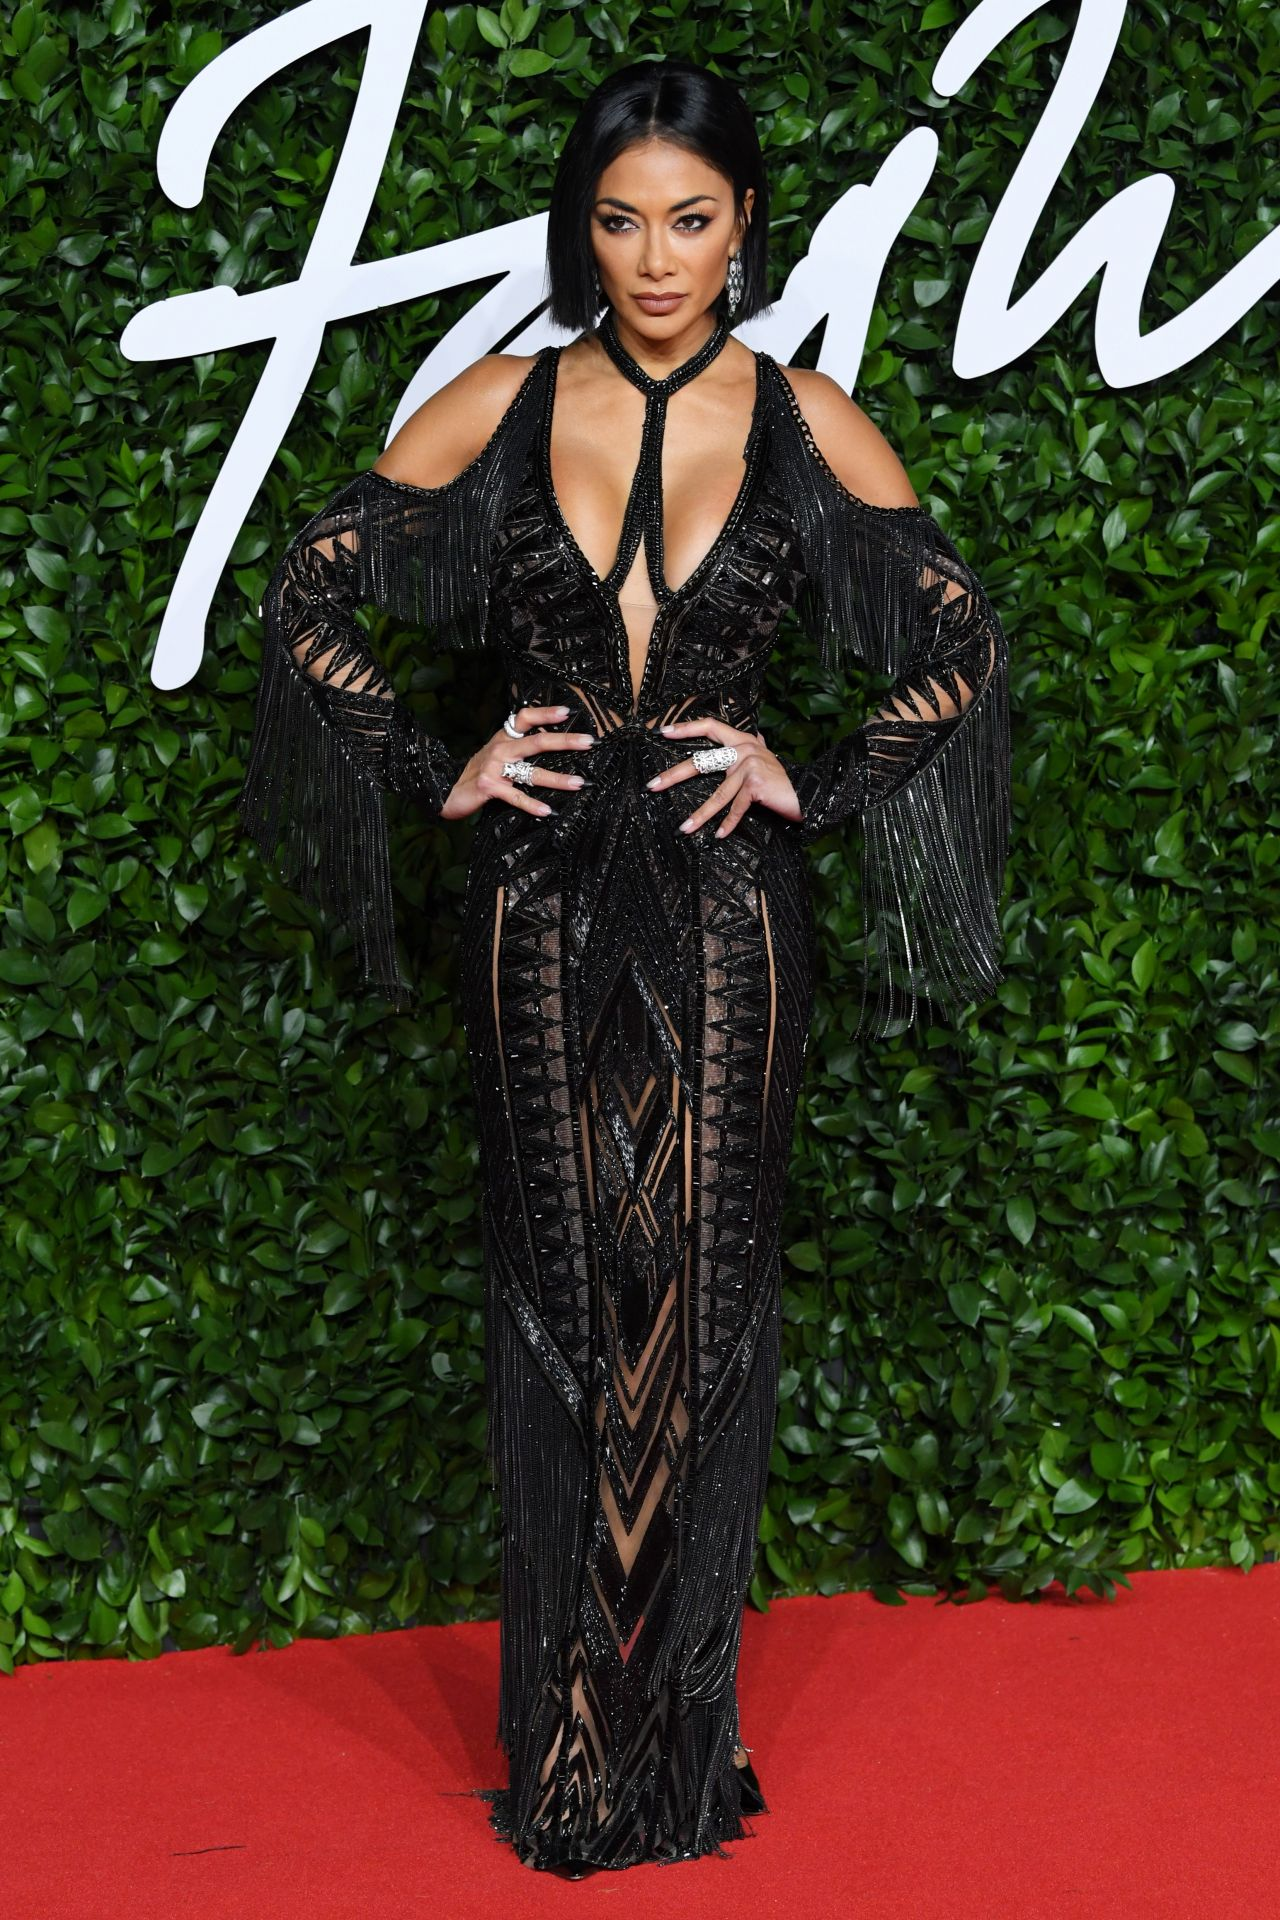 nicole-scherzinger-in-julien-macdonald-2019-british-fashion-council-awards